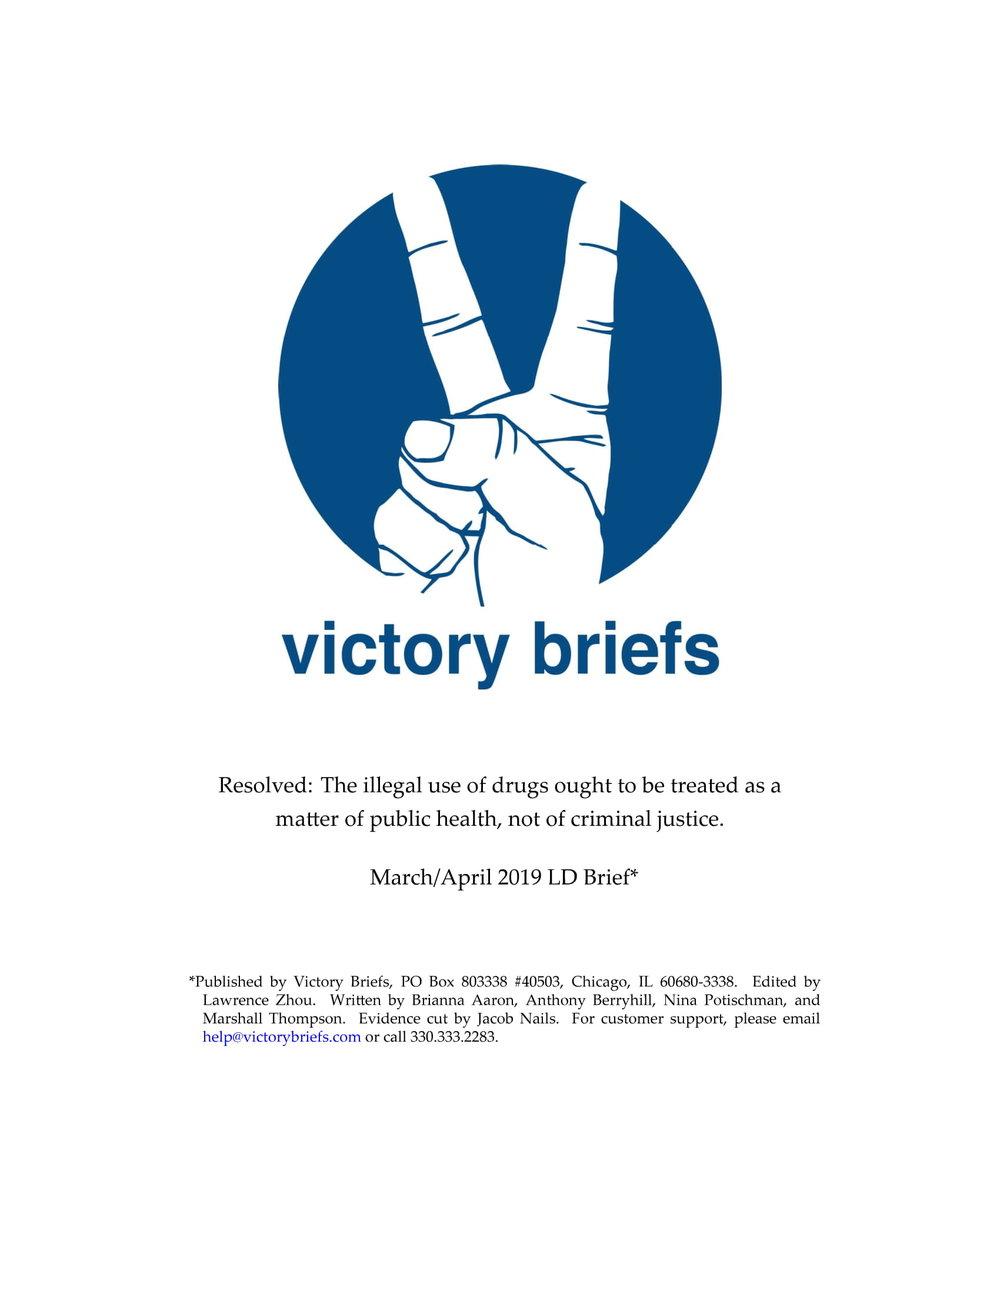 LD Mar/Apr '19 - Illegal Drugs